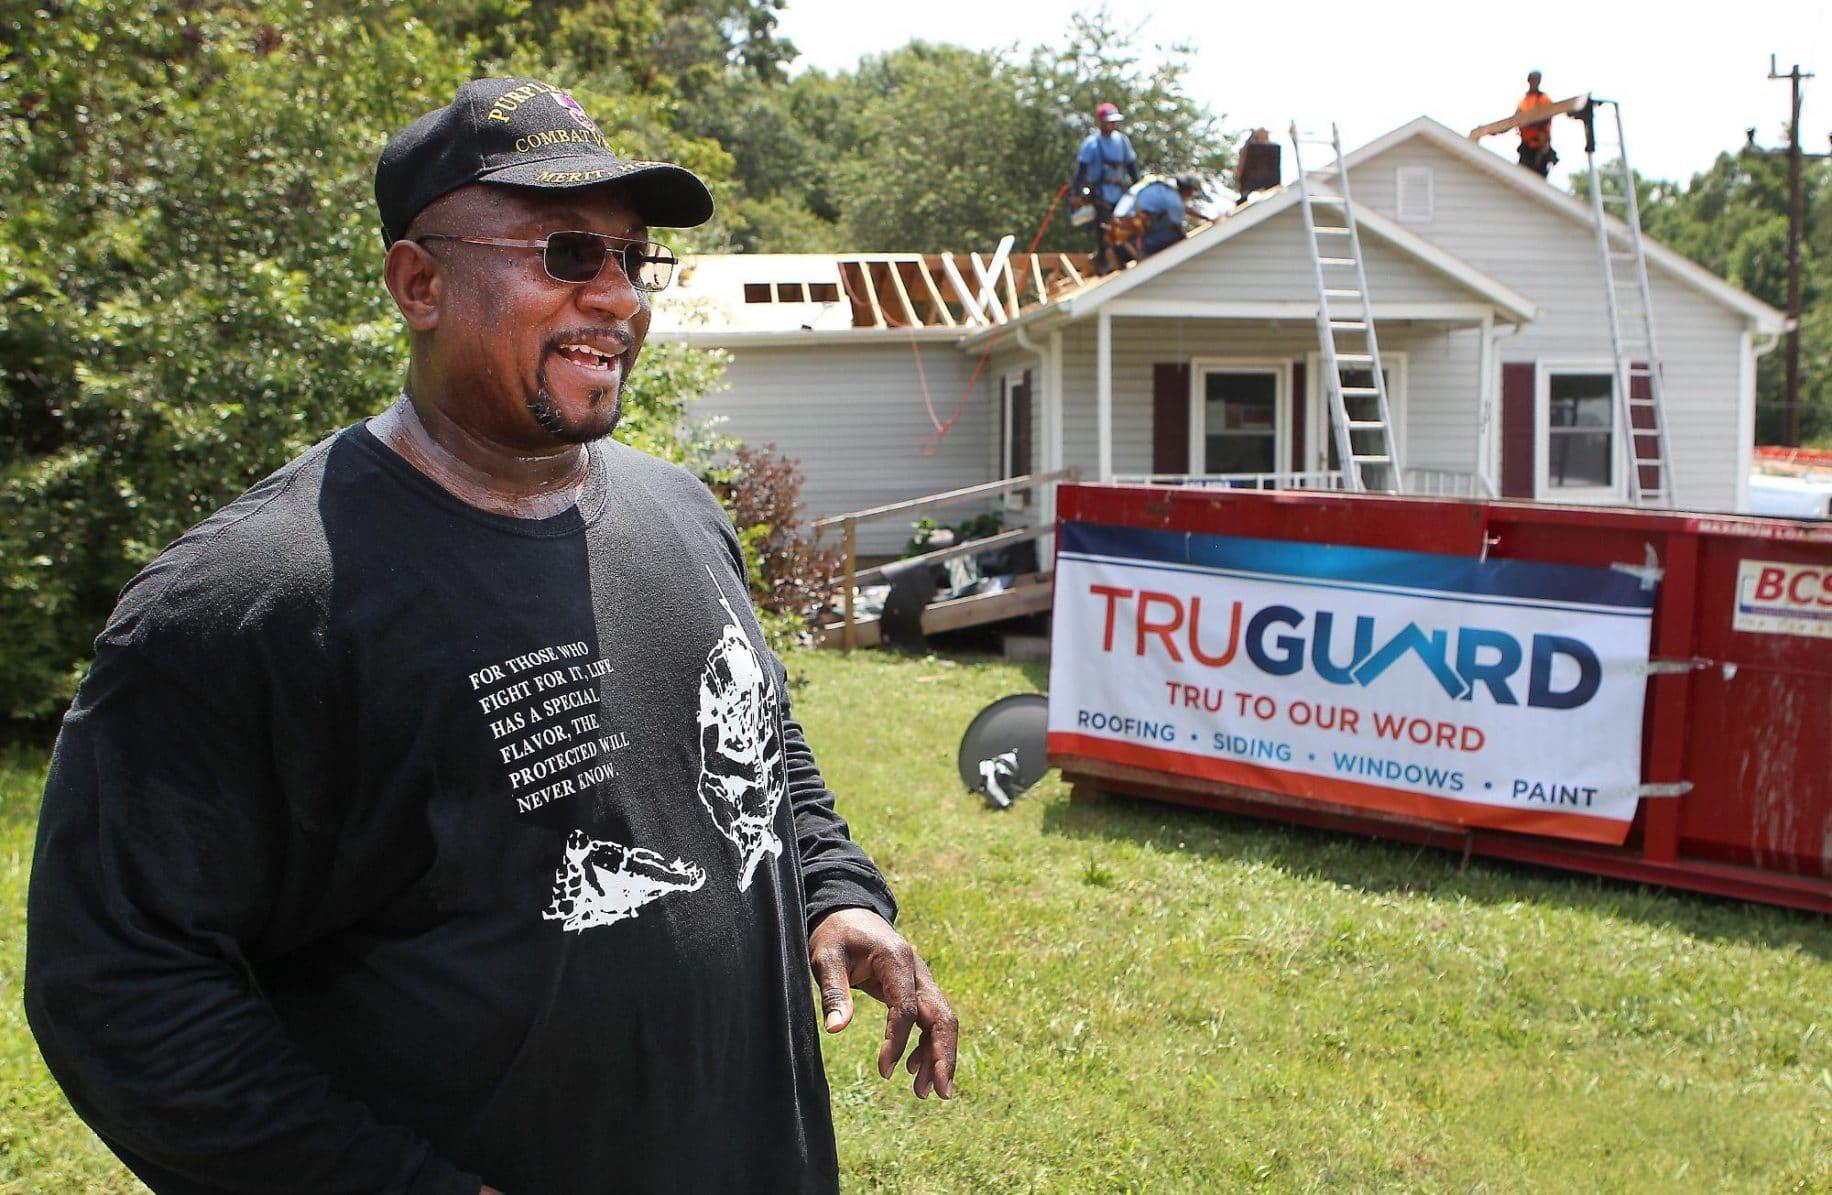 Purple Heart veteran to receive new home